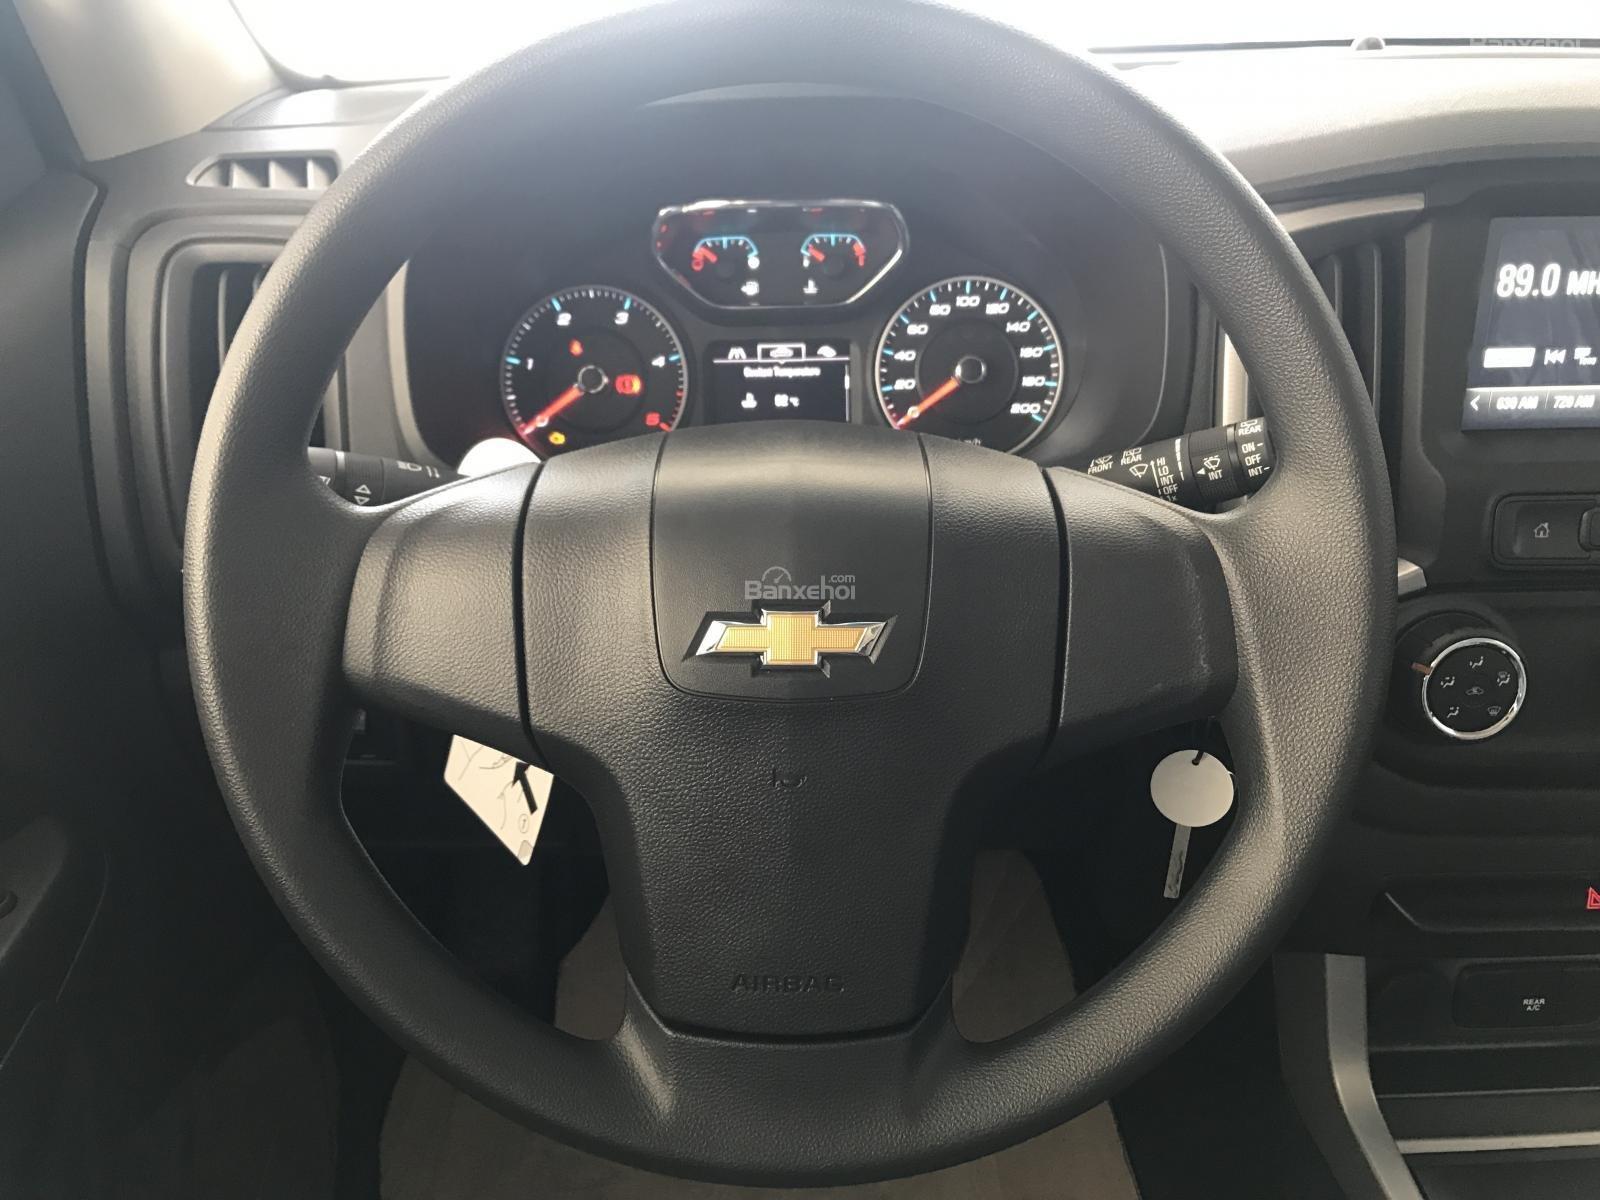 Mẫu SUV 07 chỗ Chevrolet Trailblazer 2.5L 4x2 AT 2018 (Nhập từ Thái Lan), lh 0963613200-7